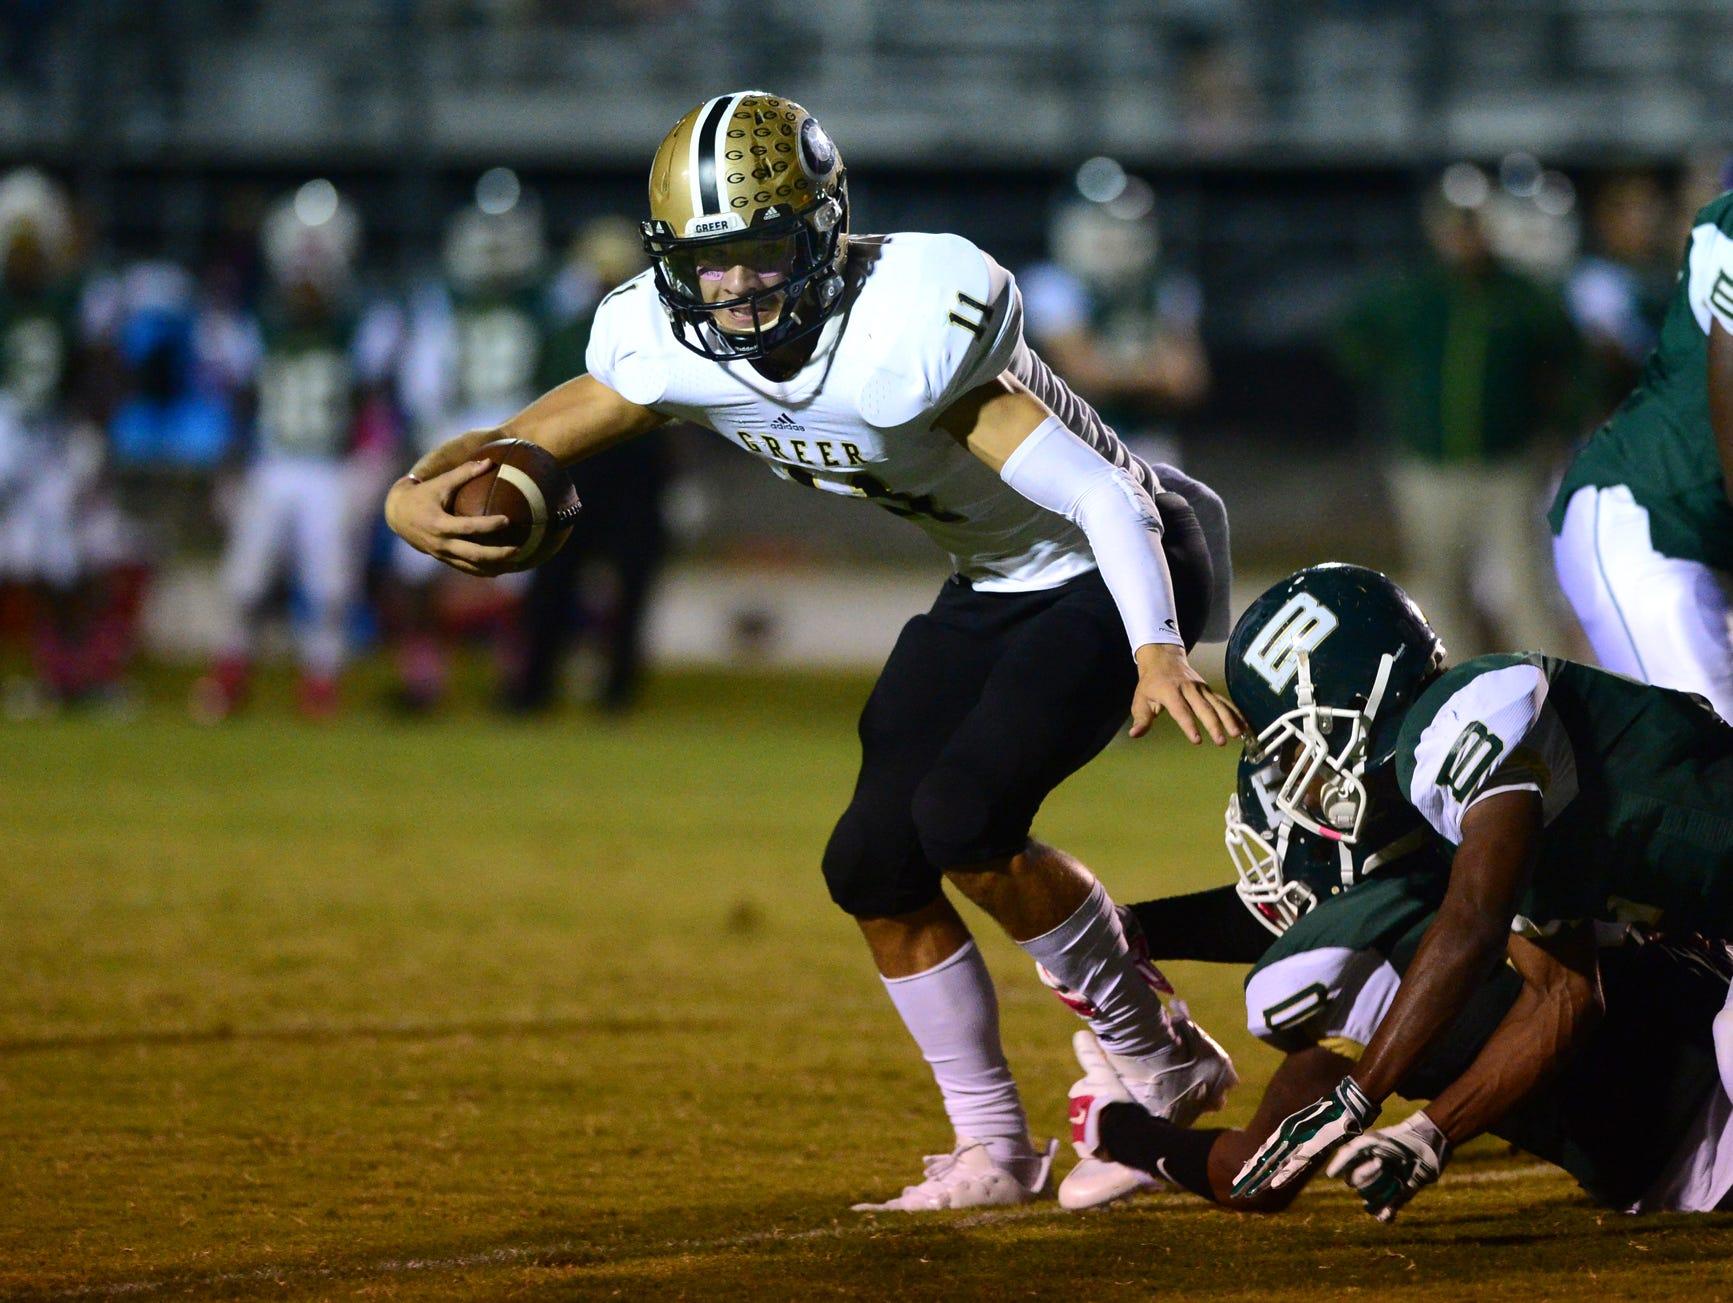 The Greer High's Mario Cusano (11) runs past Berea defense during a football game at Berea on Friday, October 9, 2015.